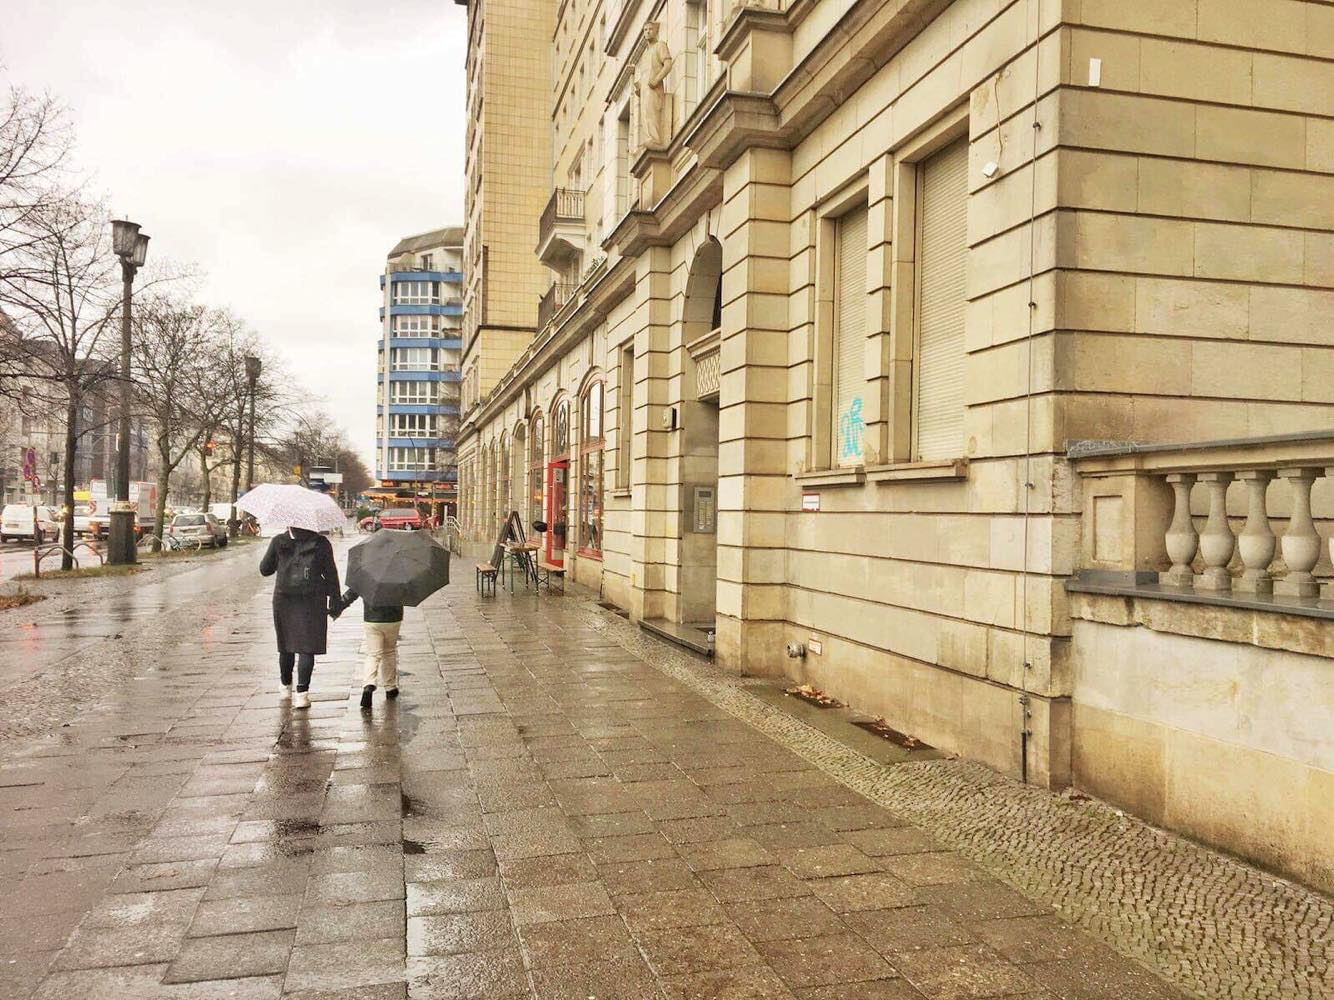 berlin bei regen was machen